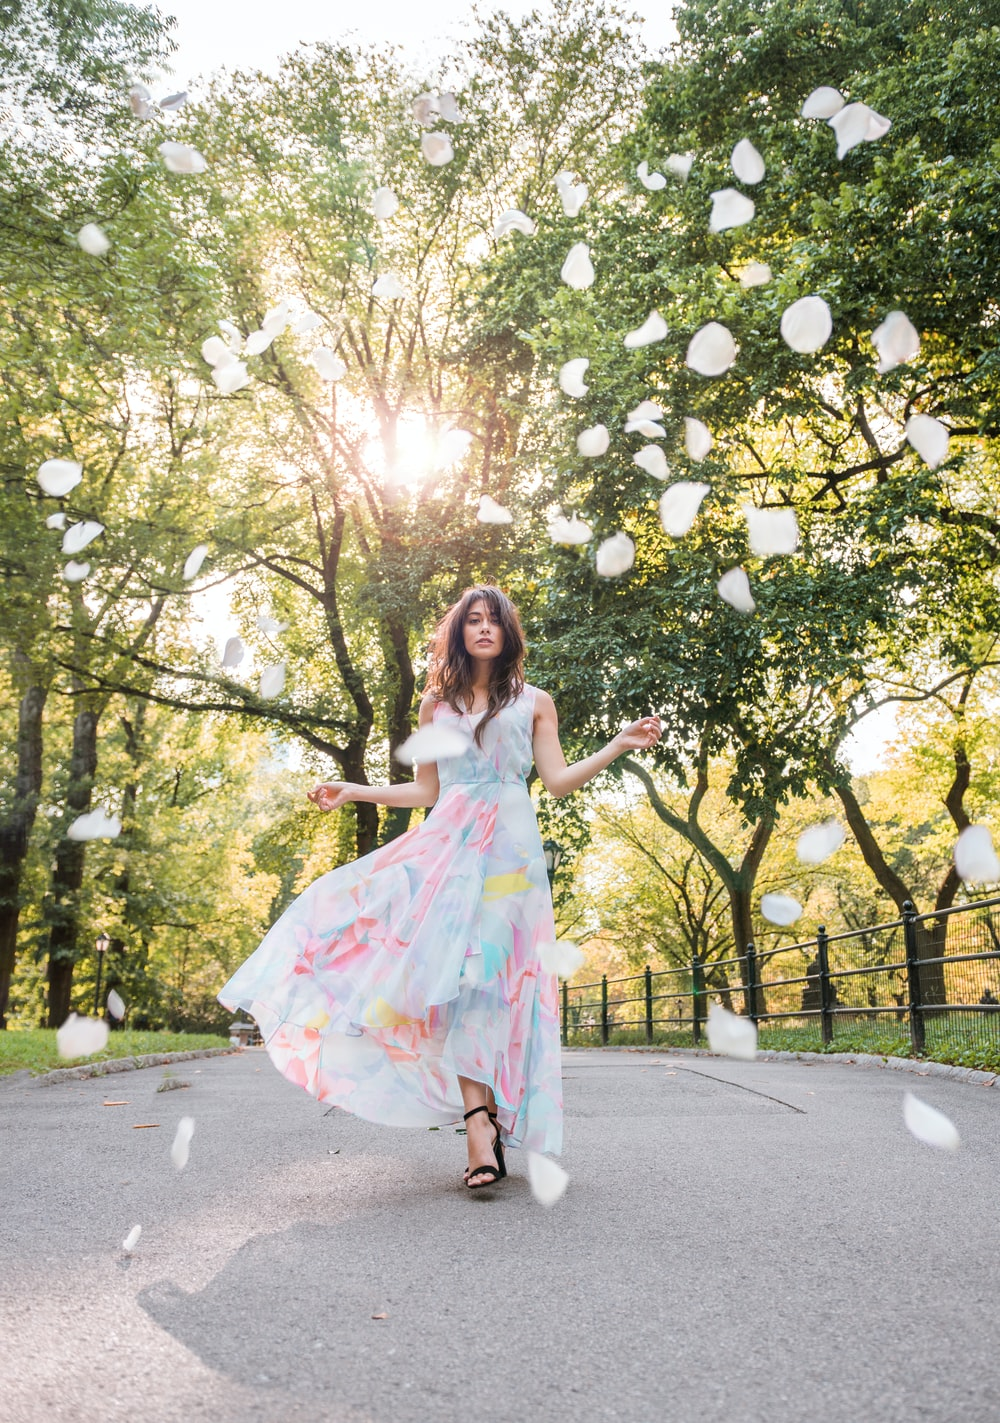 woman in floral maxi dress walking on street between trees